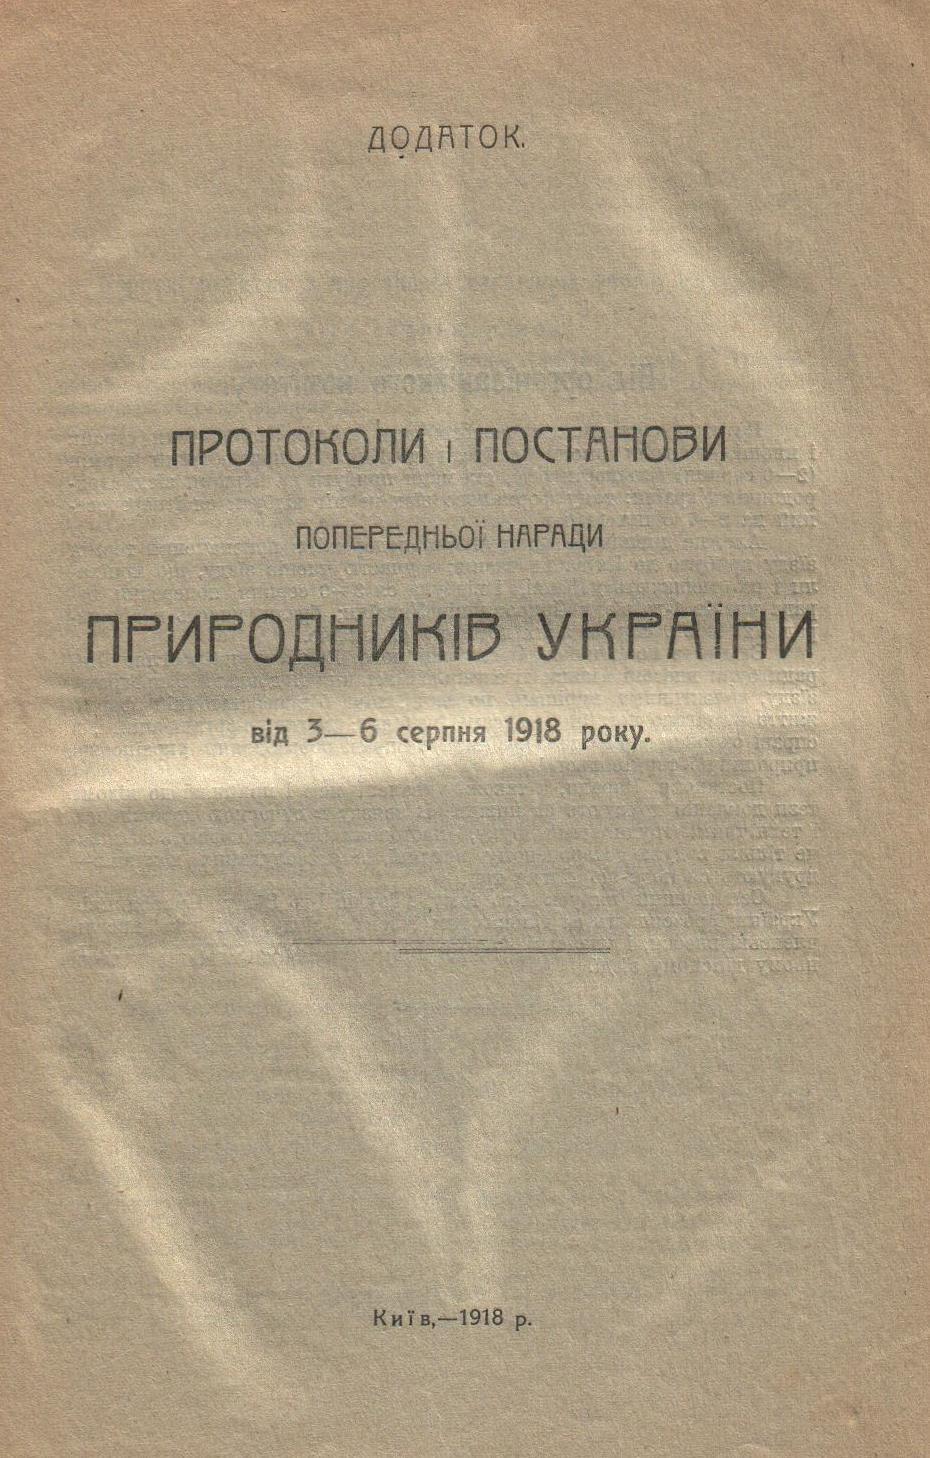 v-078_